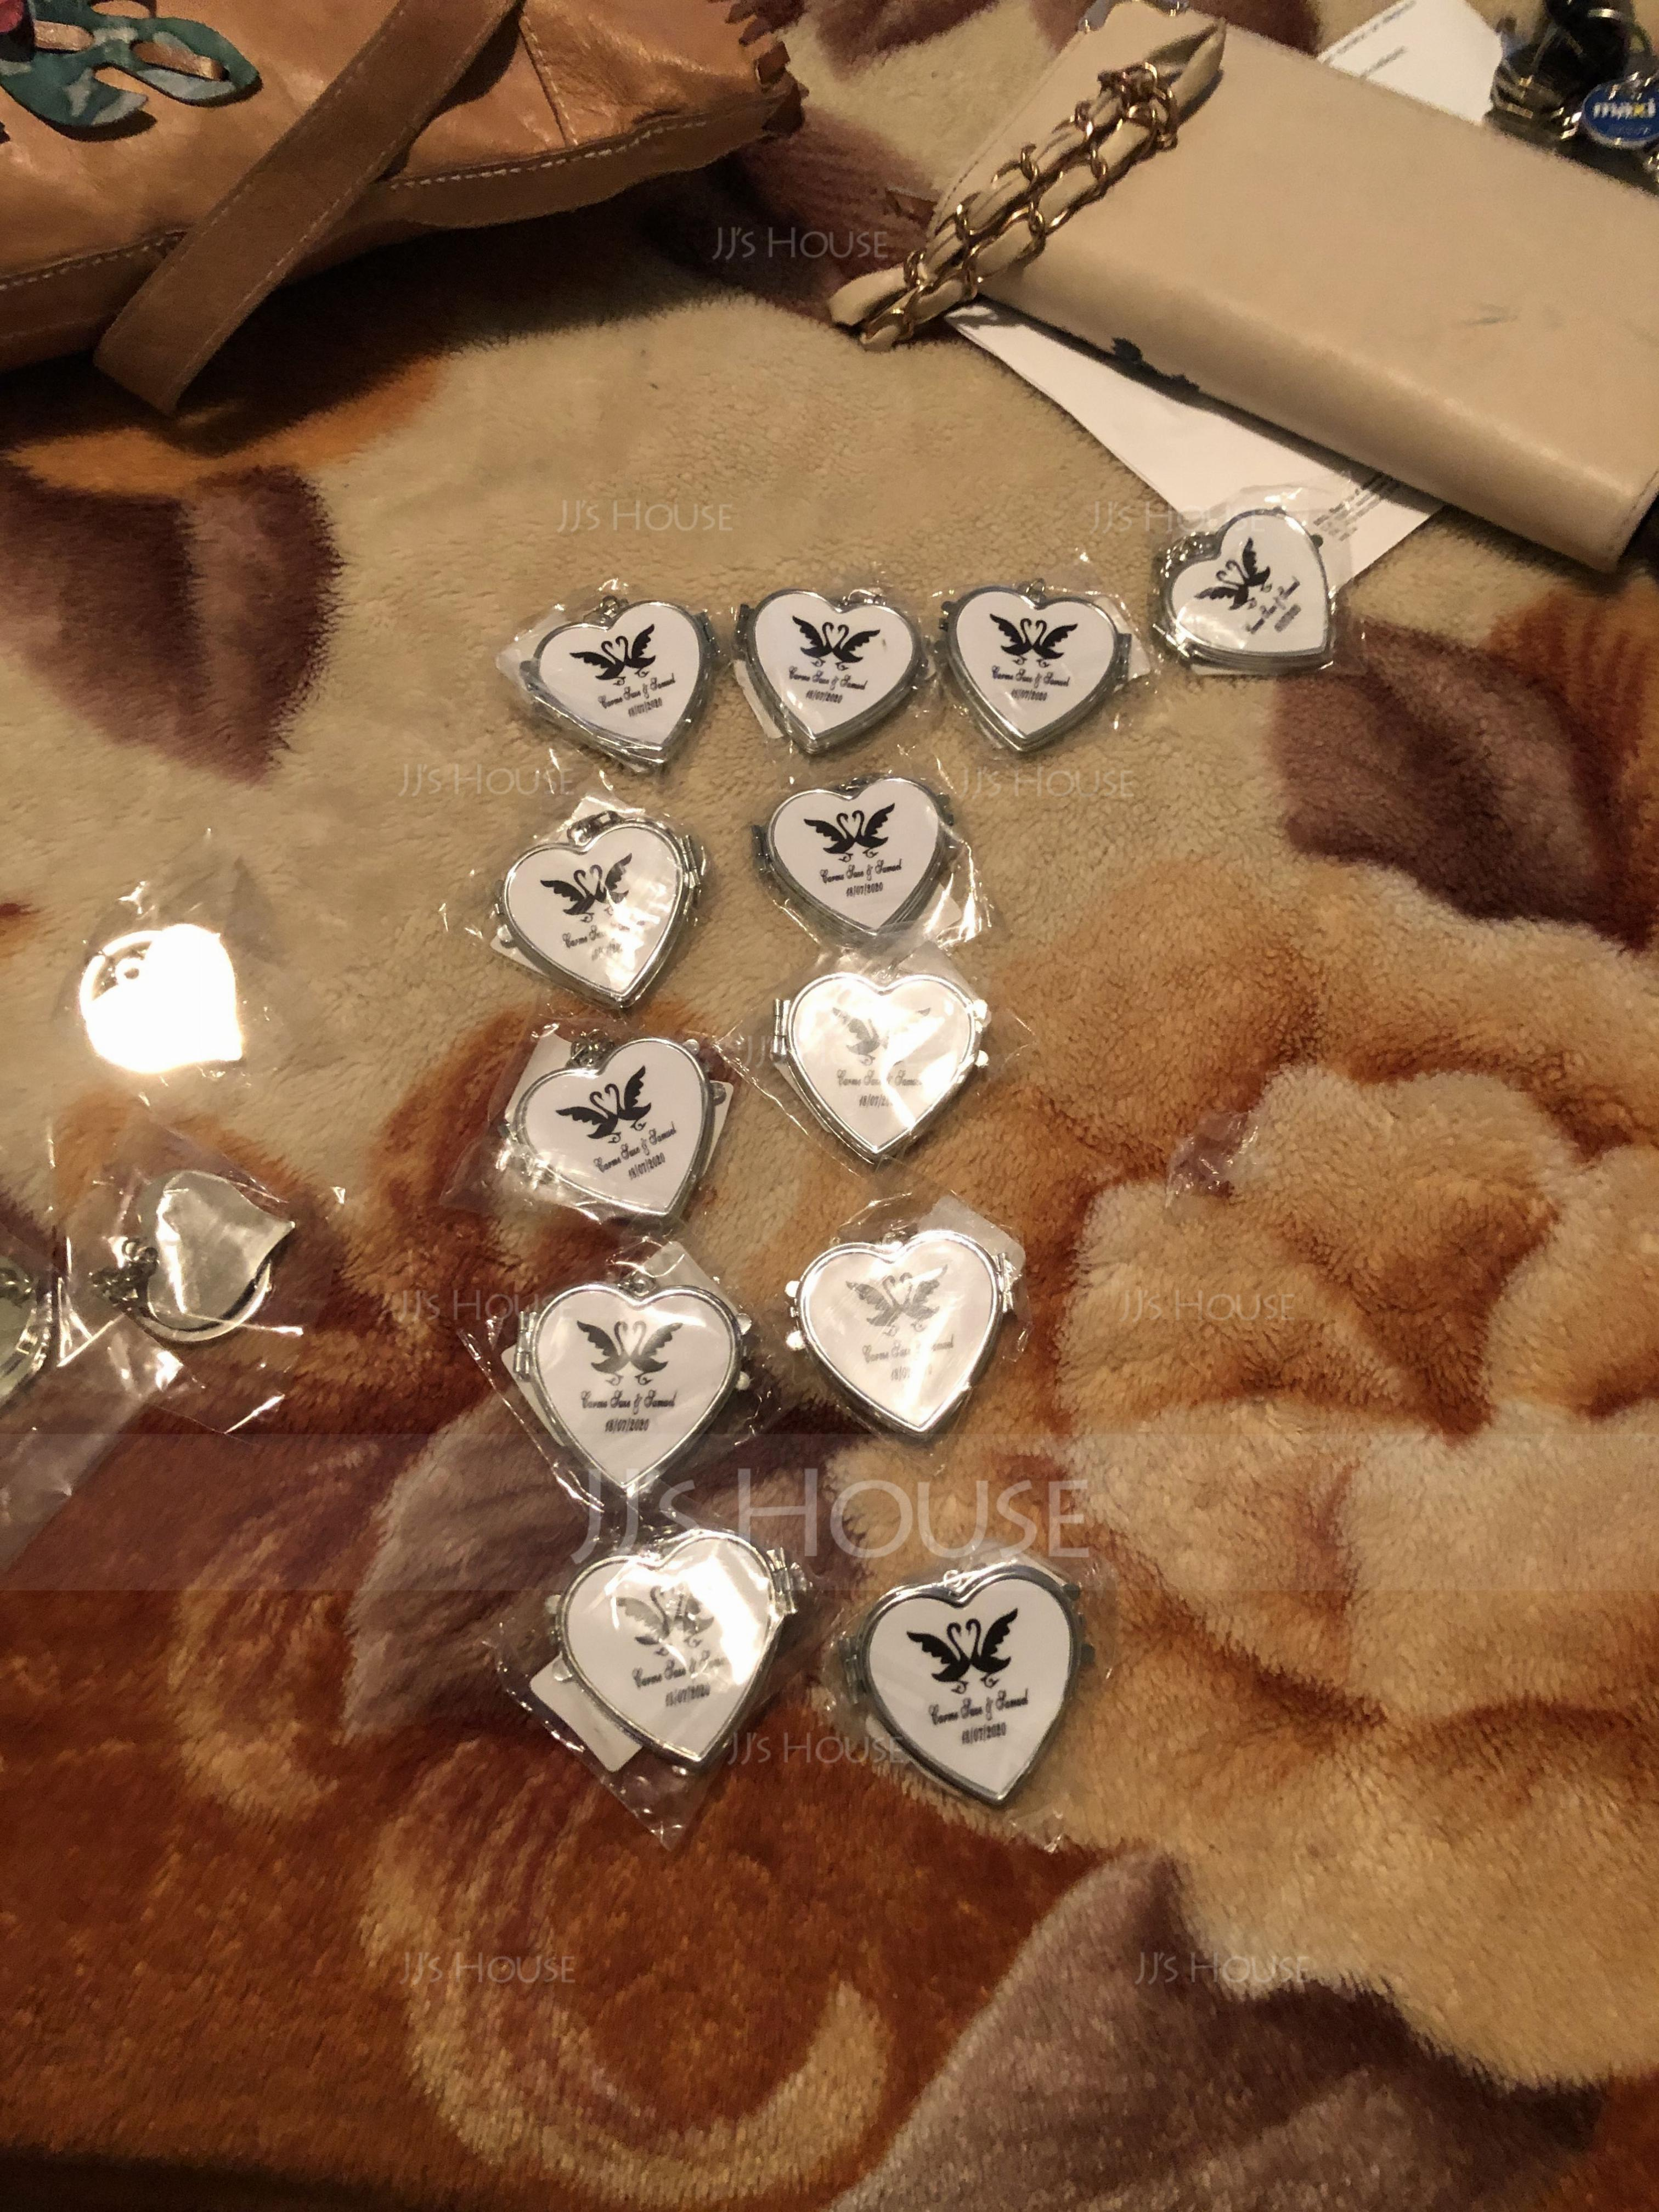 Personalized Heart Shaped Zinc Alloy Keychains (Set of 4) (118031772)